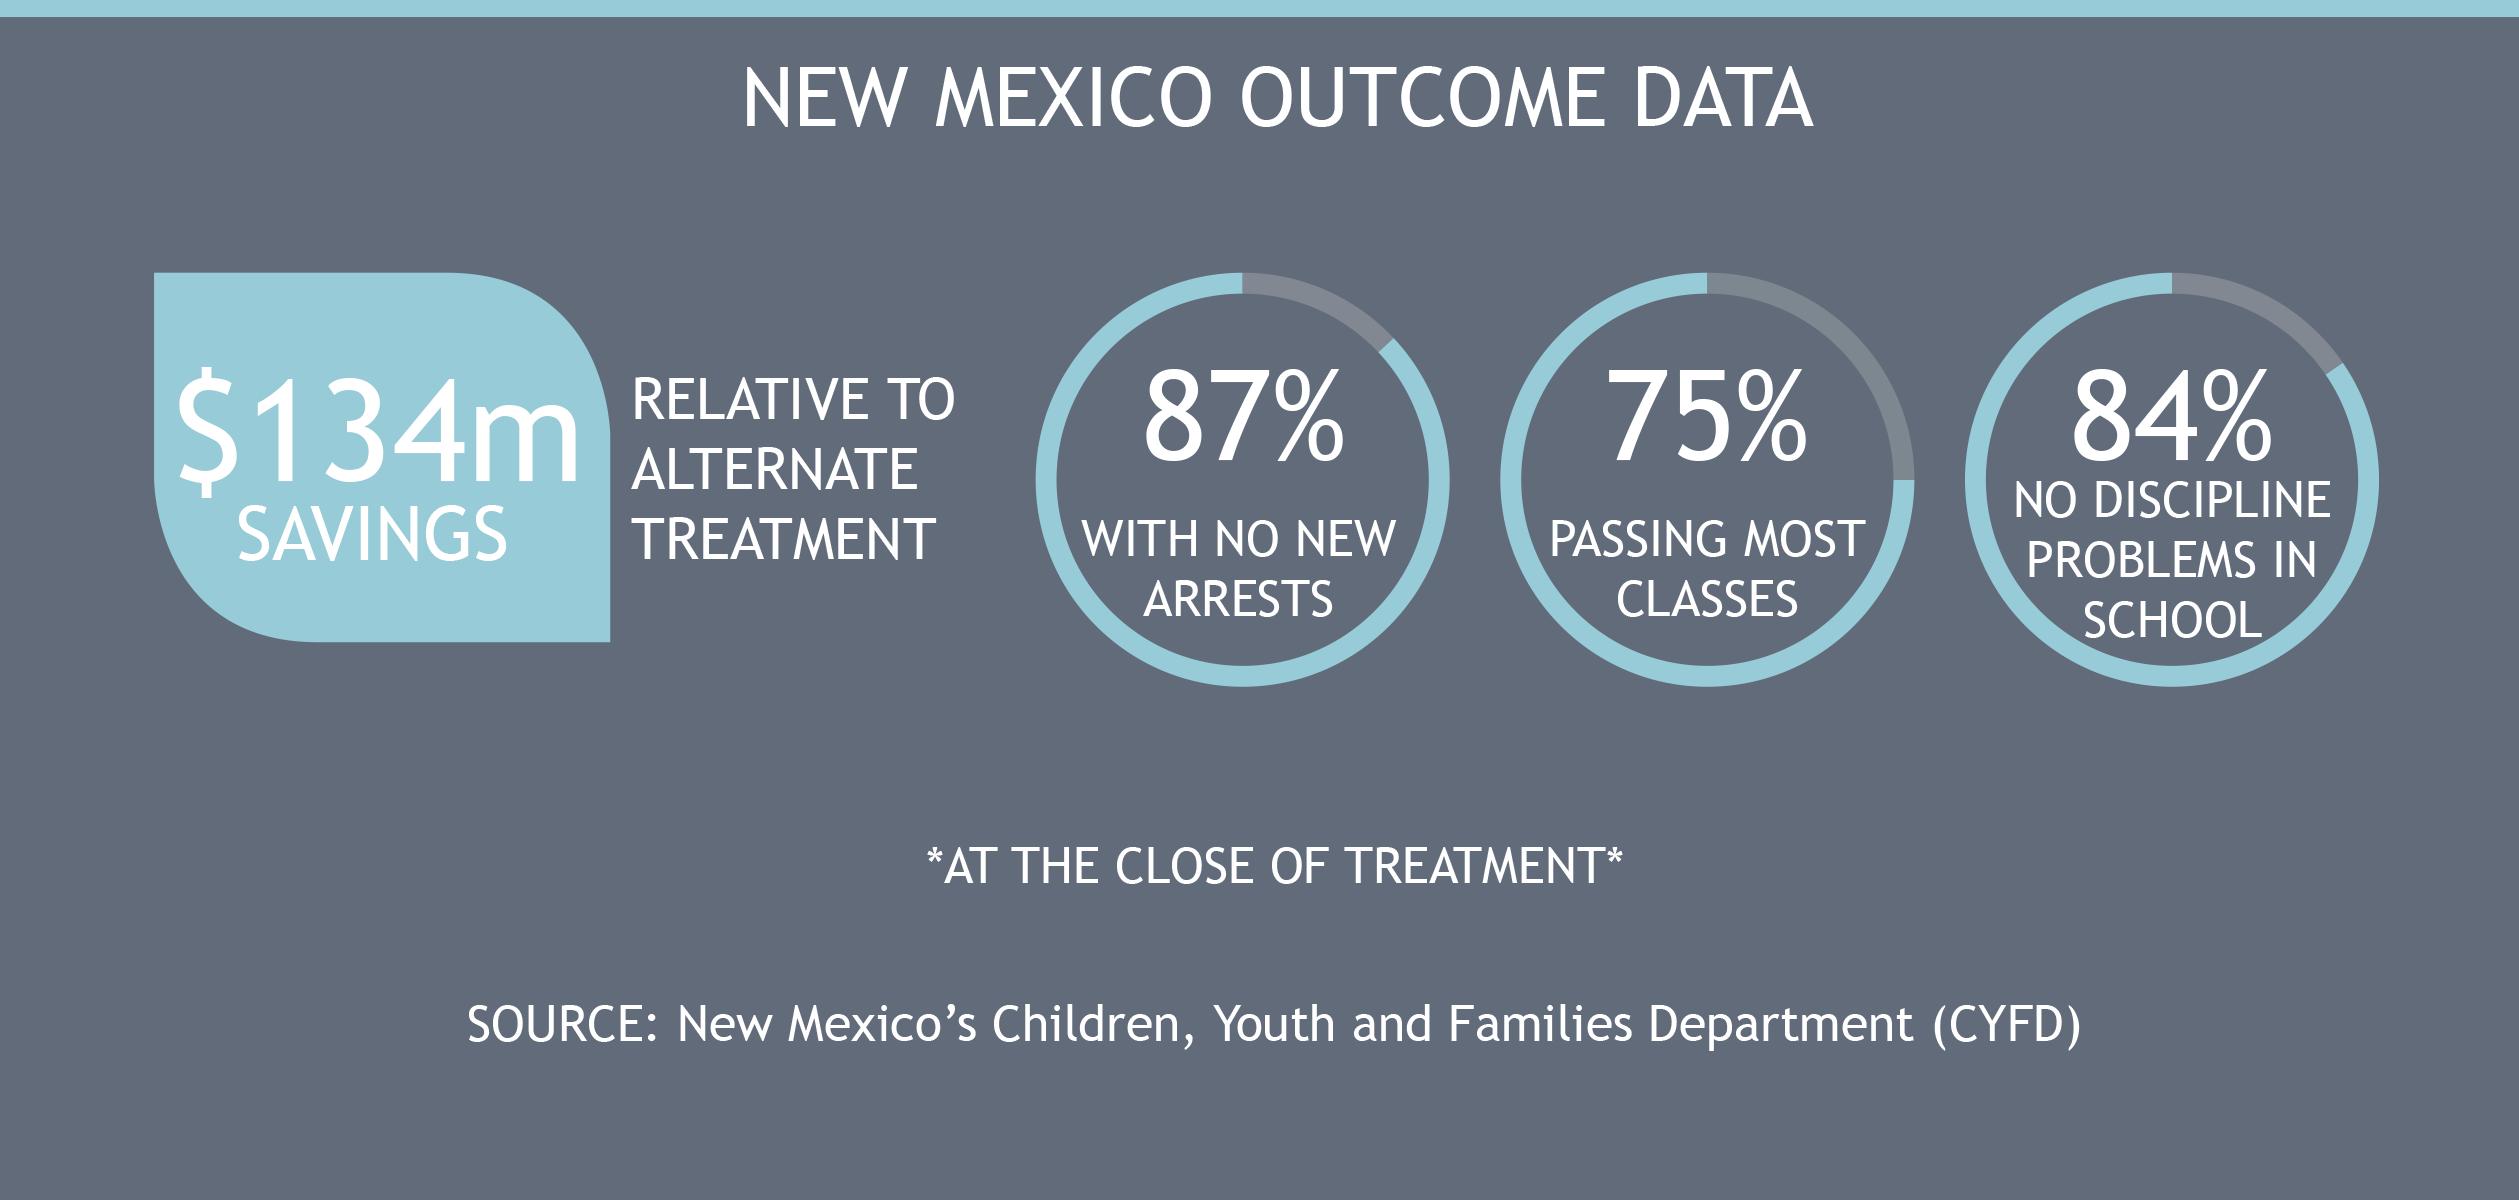 New Mexico Outcome